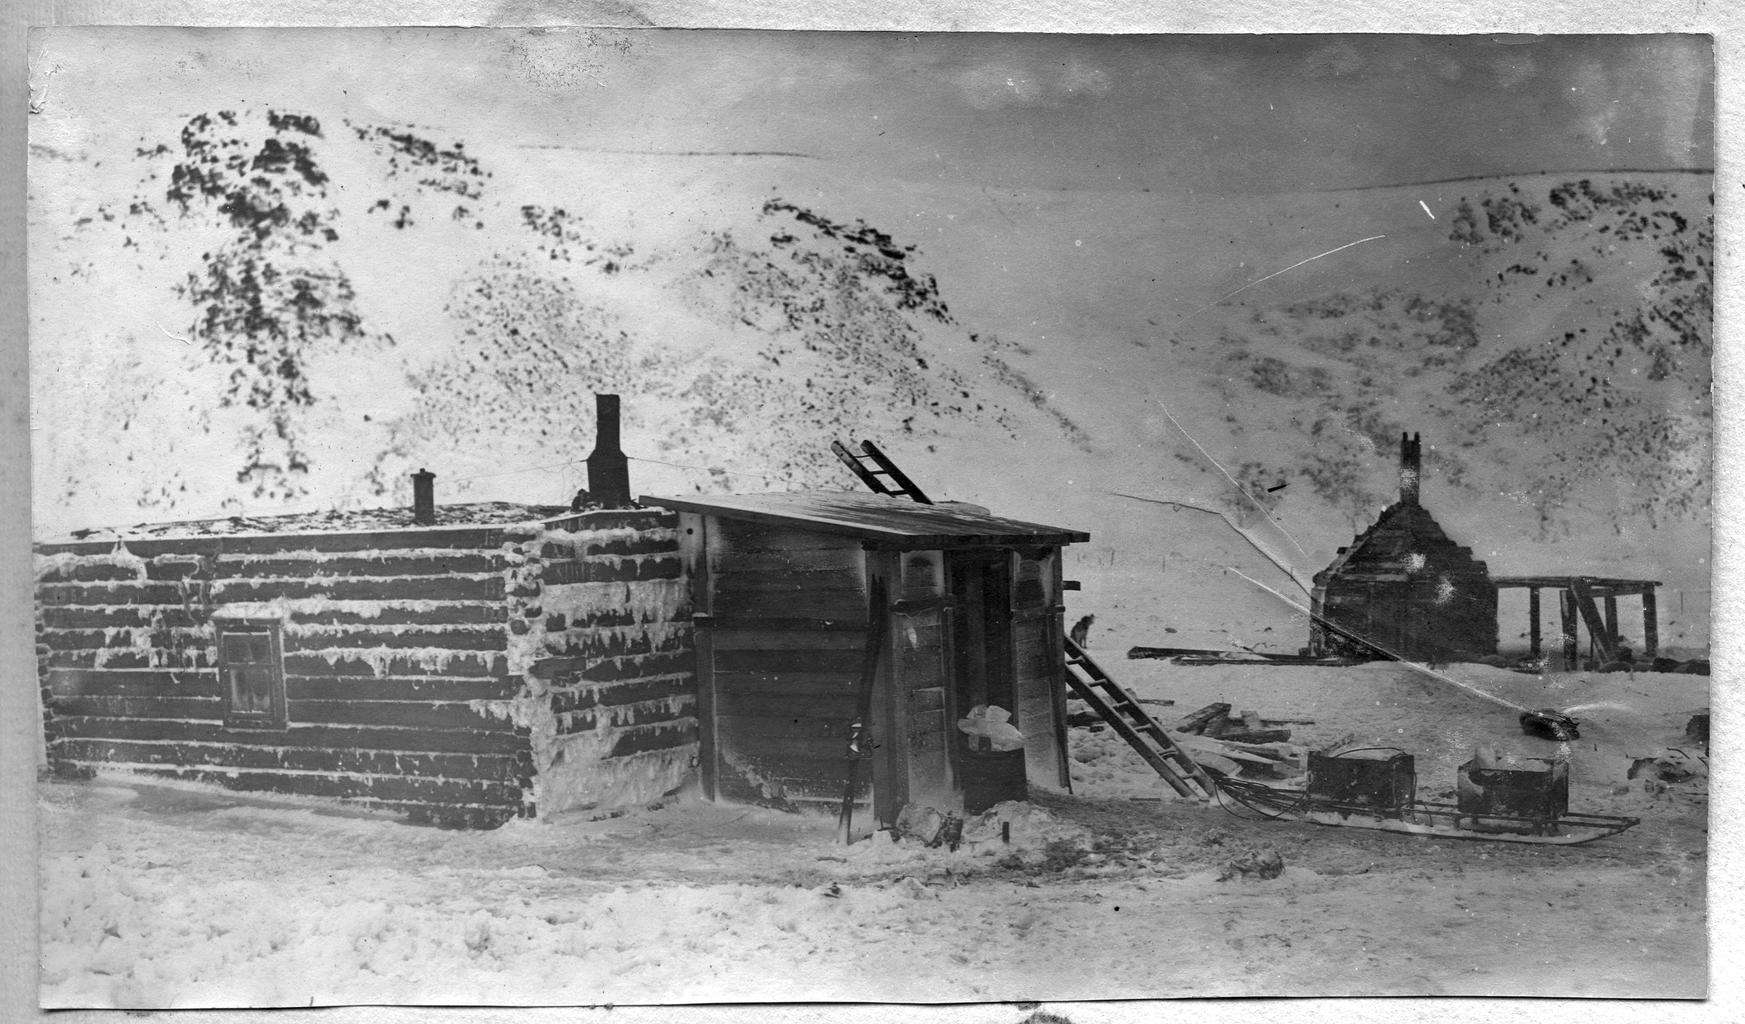 Зимовка. Баня и собачья кухня